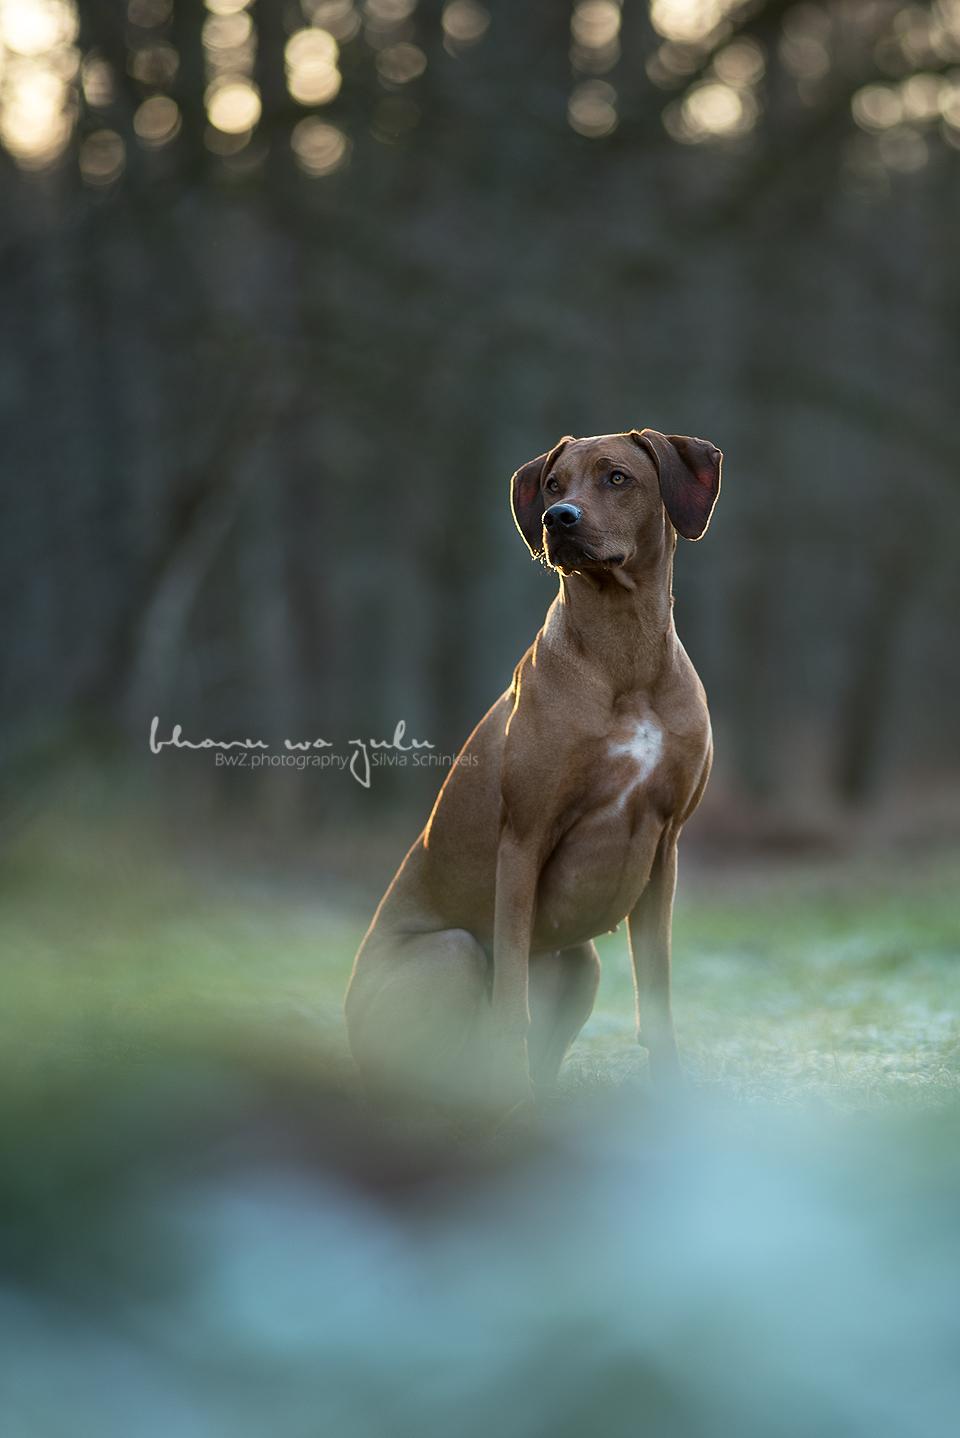 BwZ.photography Eywa Tierschutz meets Tierfotografie